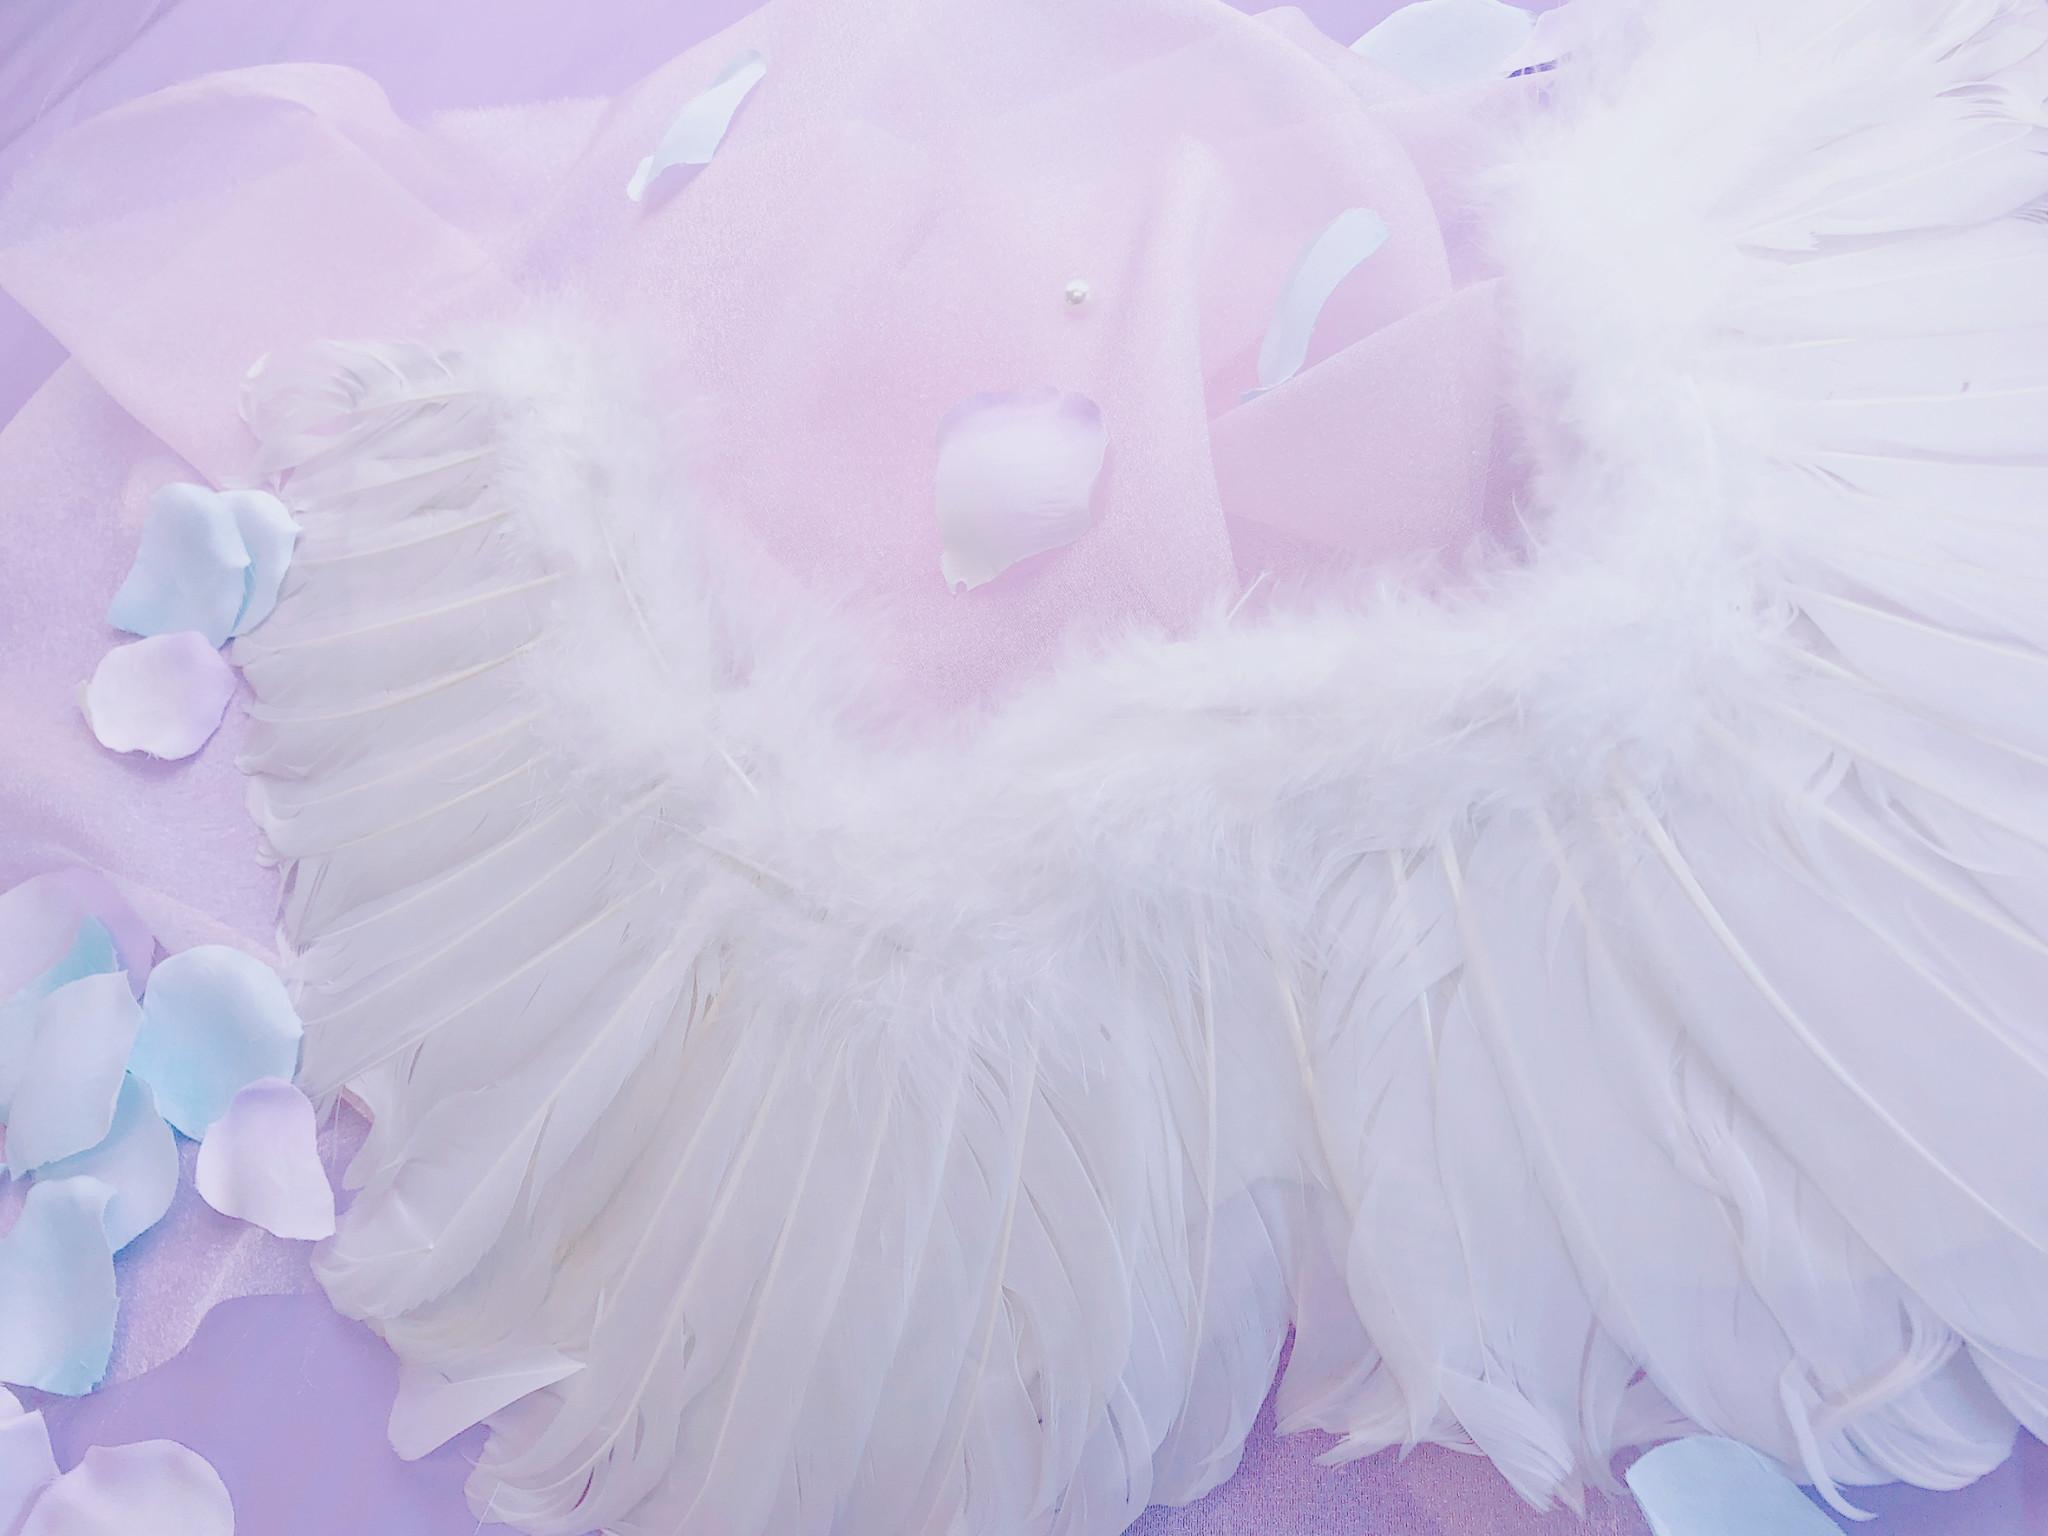 e7c69e6f9a40 意味 天使 特殊 かわいい 悪魔 絵文字 | www.gazoit.com